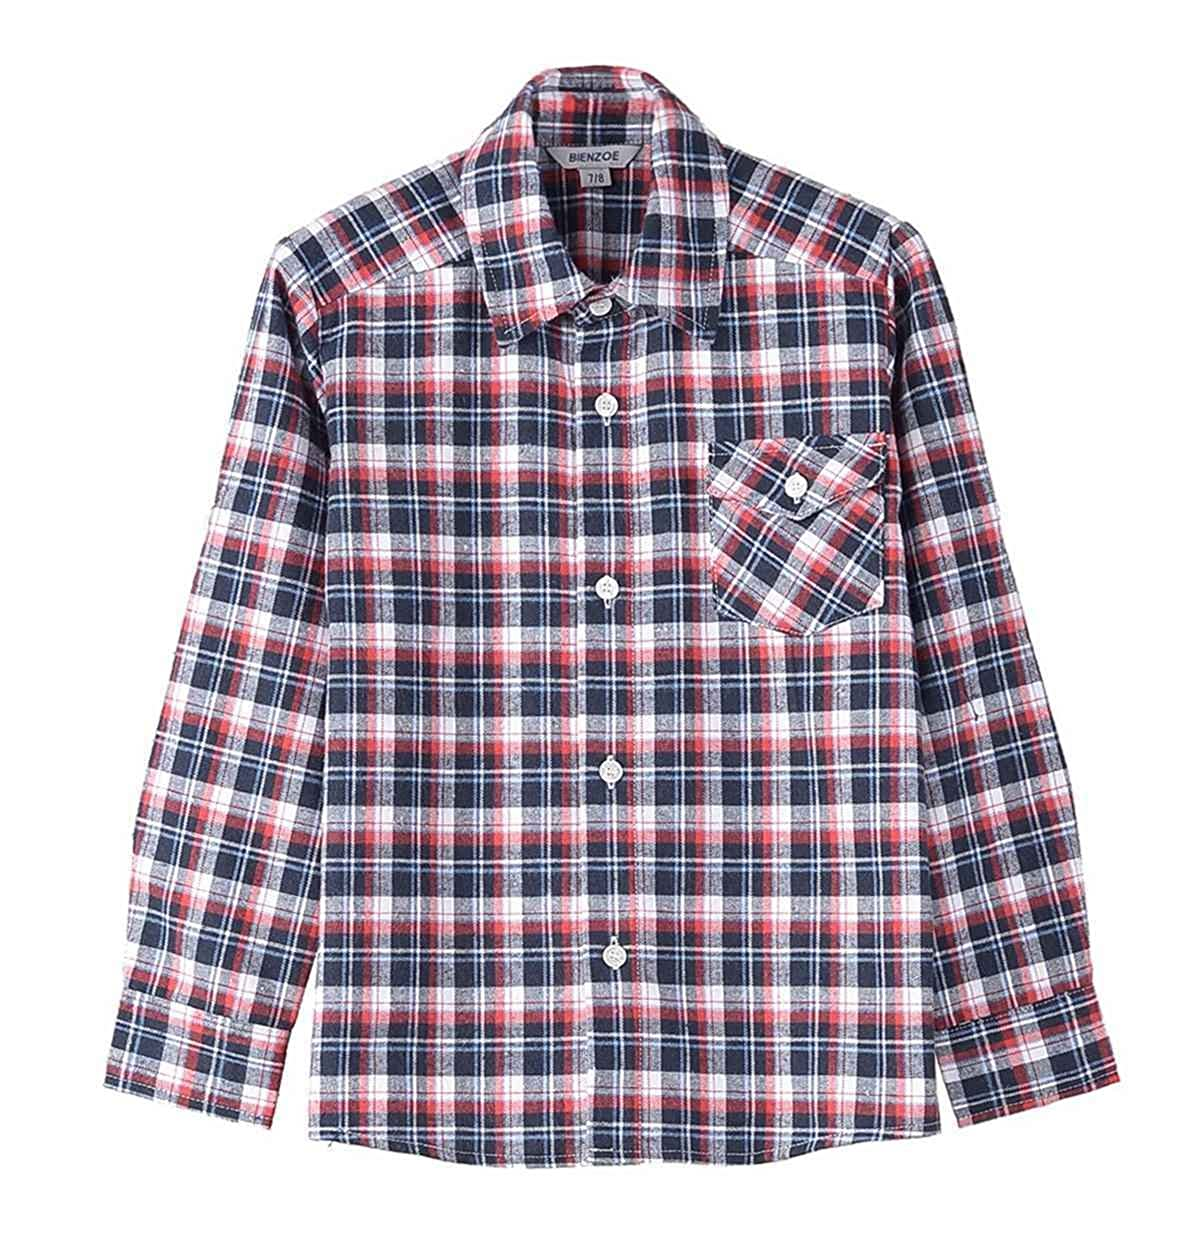 Bienzoe Boy's Warm Flannel Button Down Long Sleeve Plaid Shirt